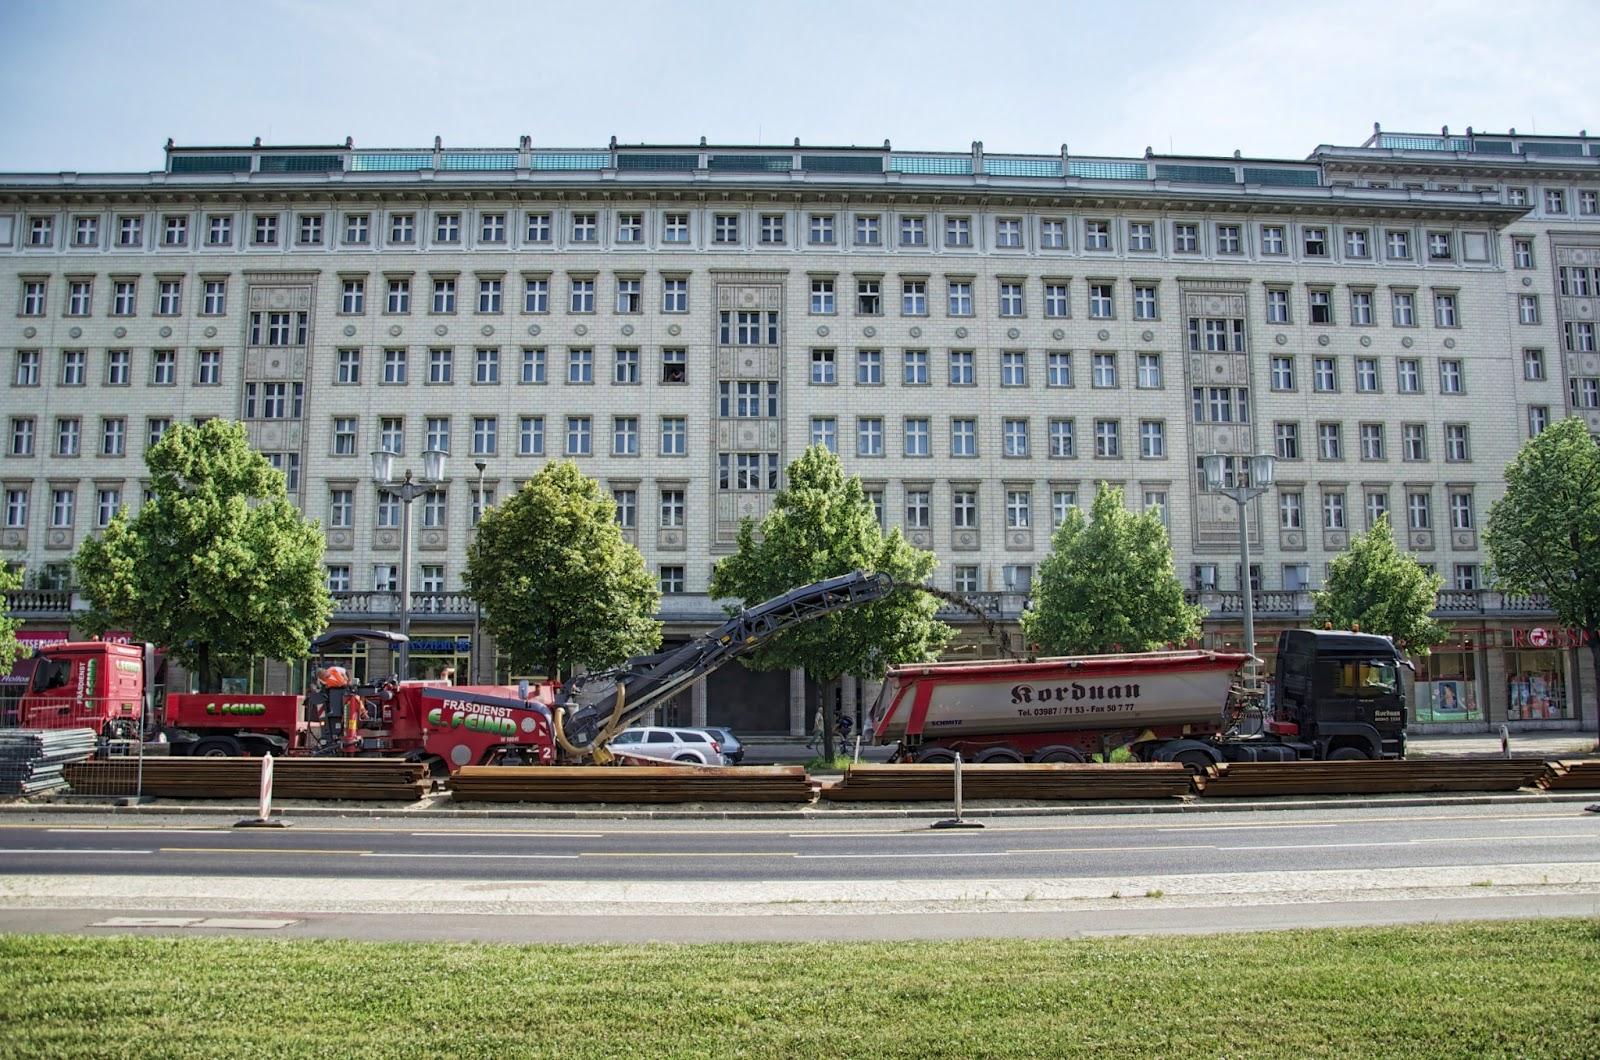 berliner baustellen 0045 baustelle karl marx allee 68 asphaltfr se arbeiten 10243 berlin. Black Bedroom Furniture Sets. Home Design Ideas